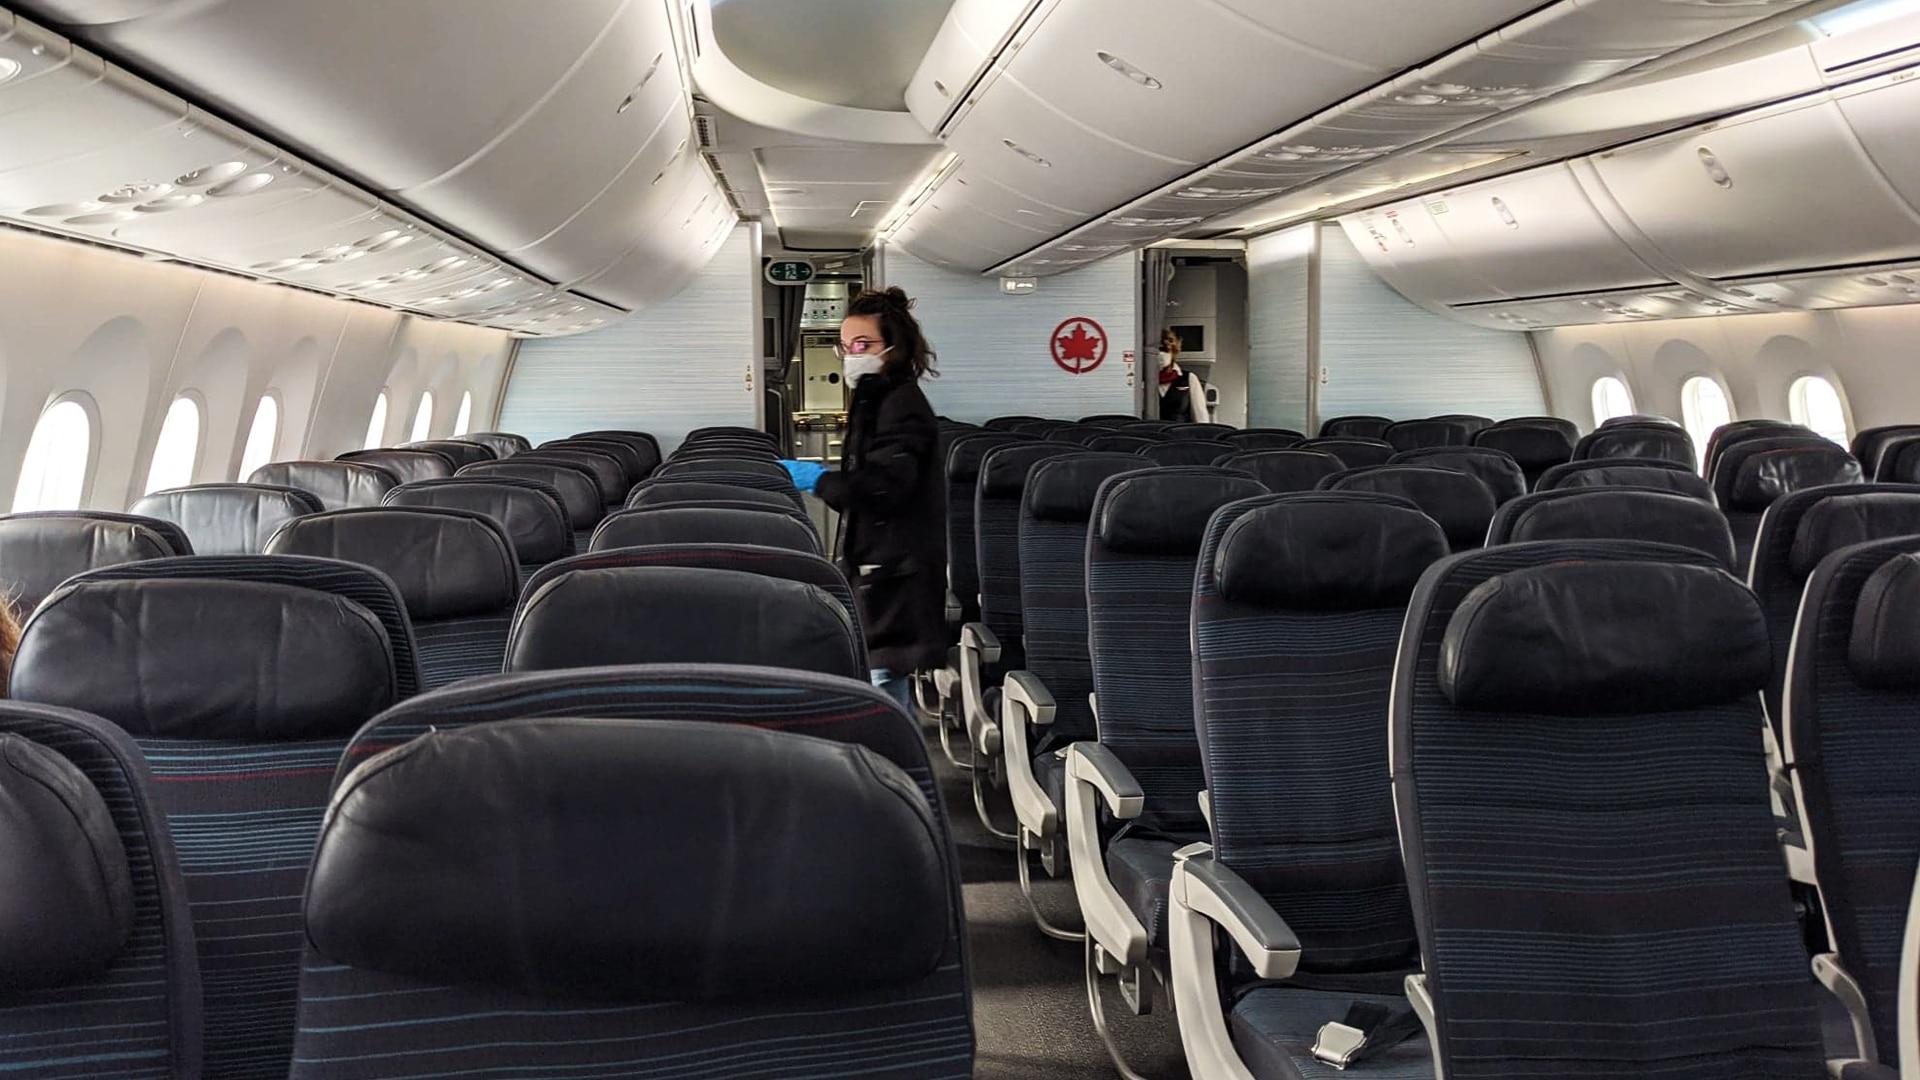 Prendre l'avion pendant le coronavirus : il faut éviter les toilettes